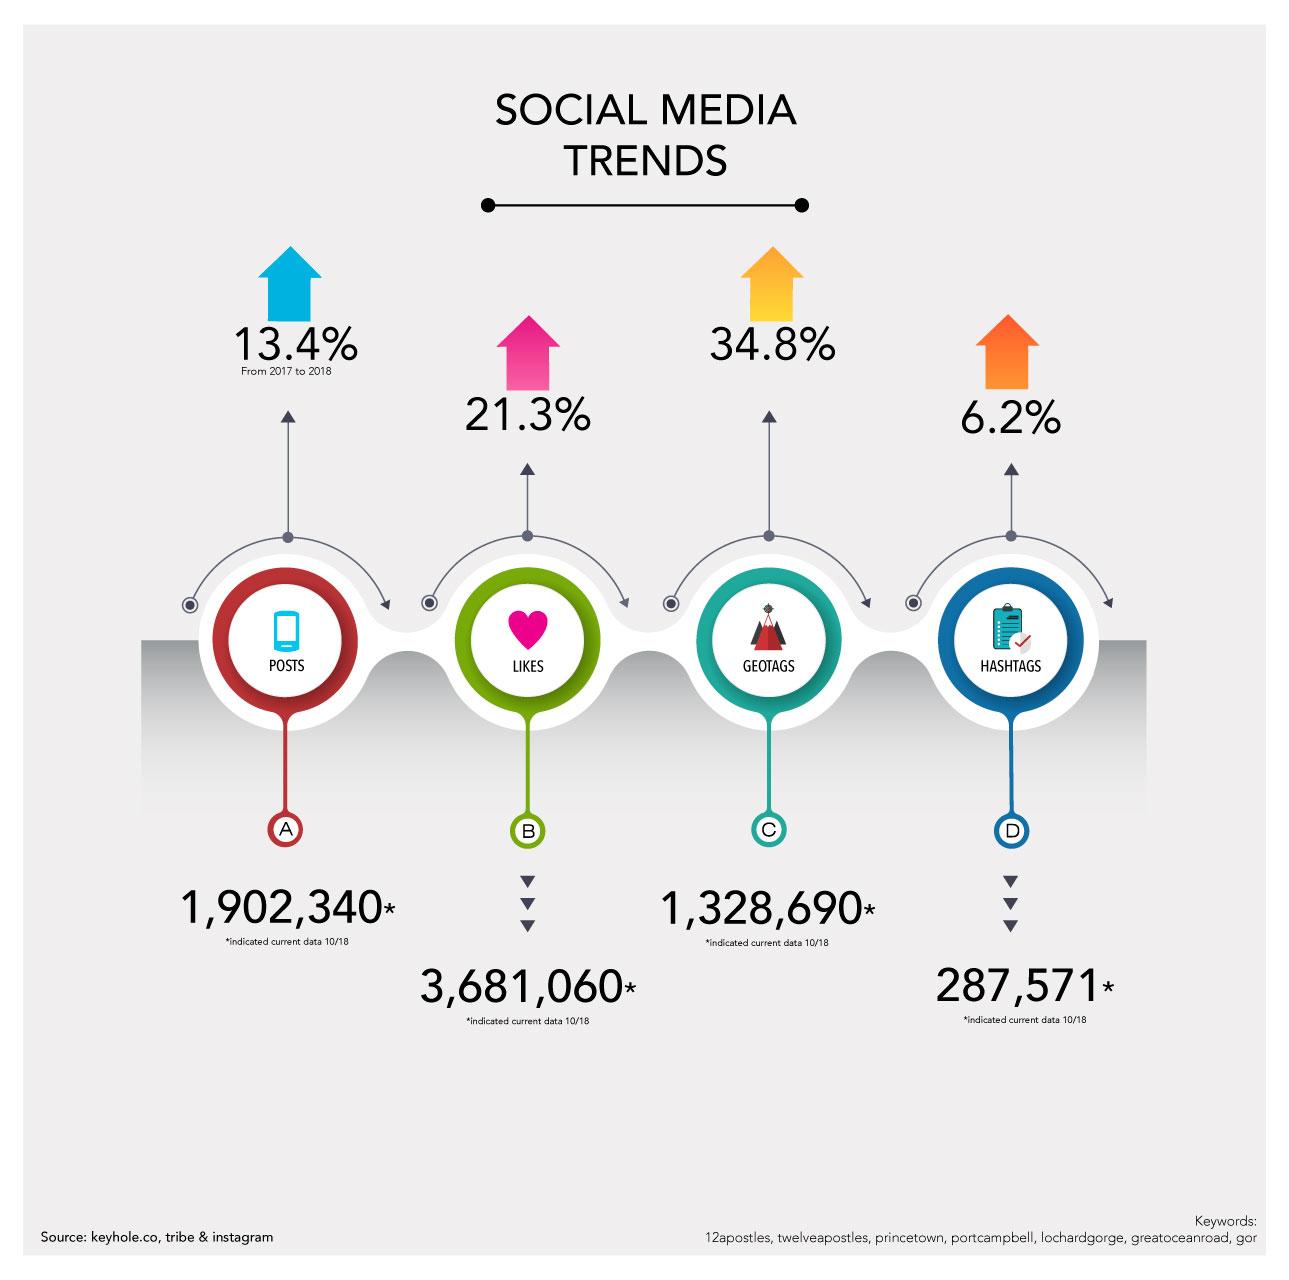 Port Campbell 12 Apostles Social Media Data  (click image to enlarge)